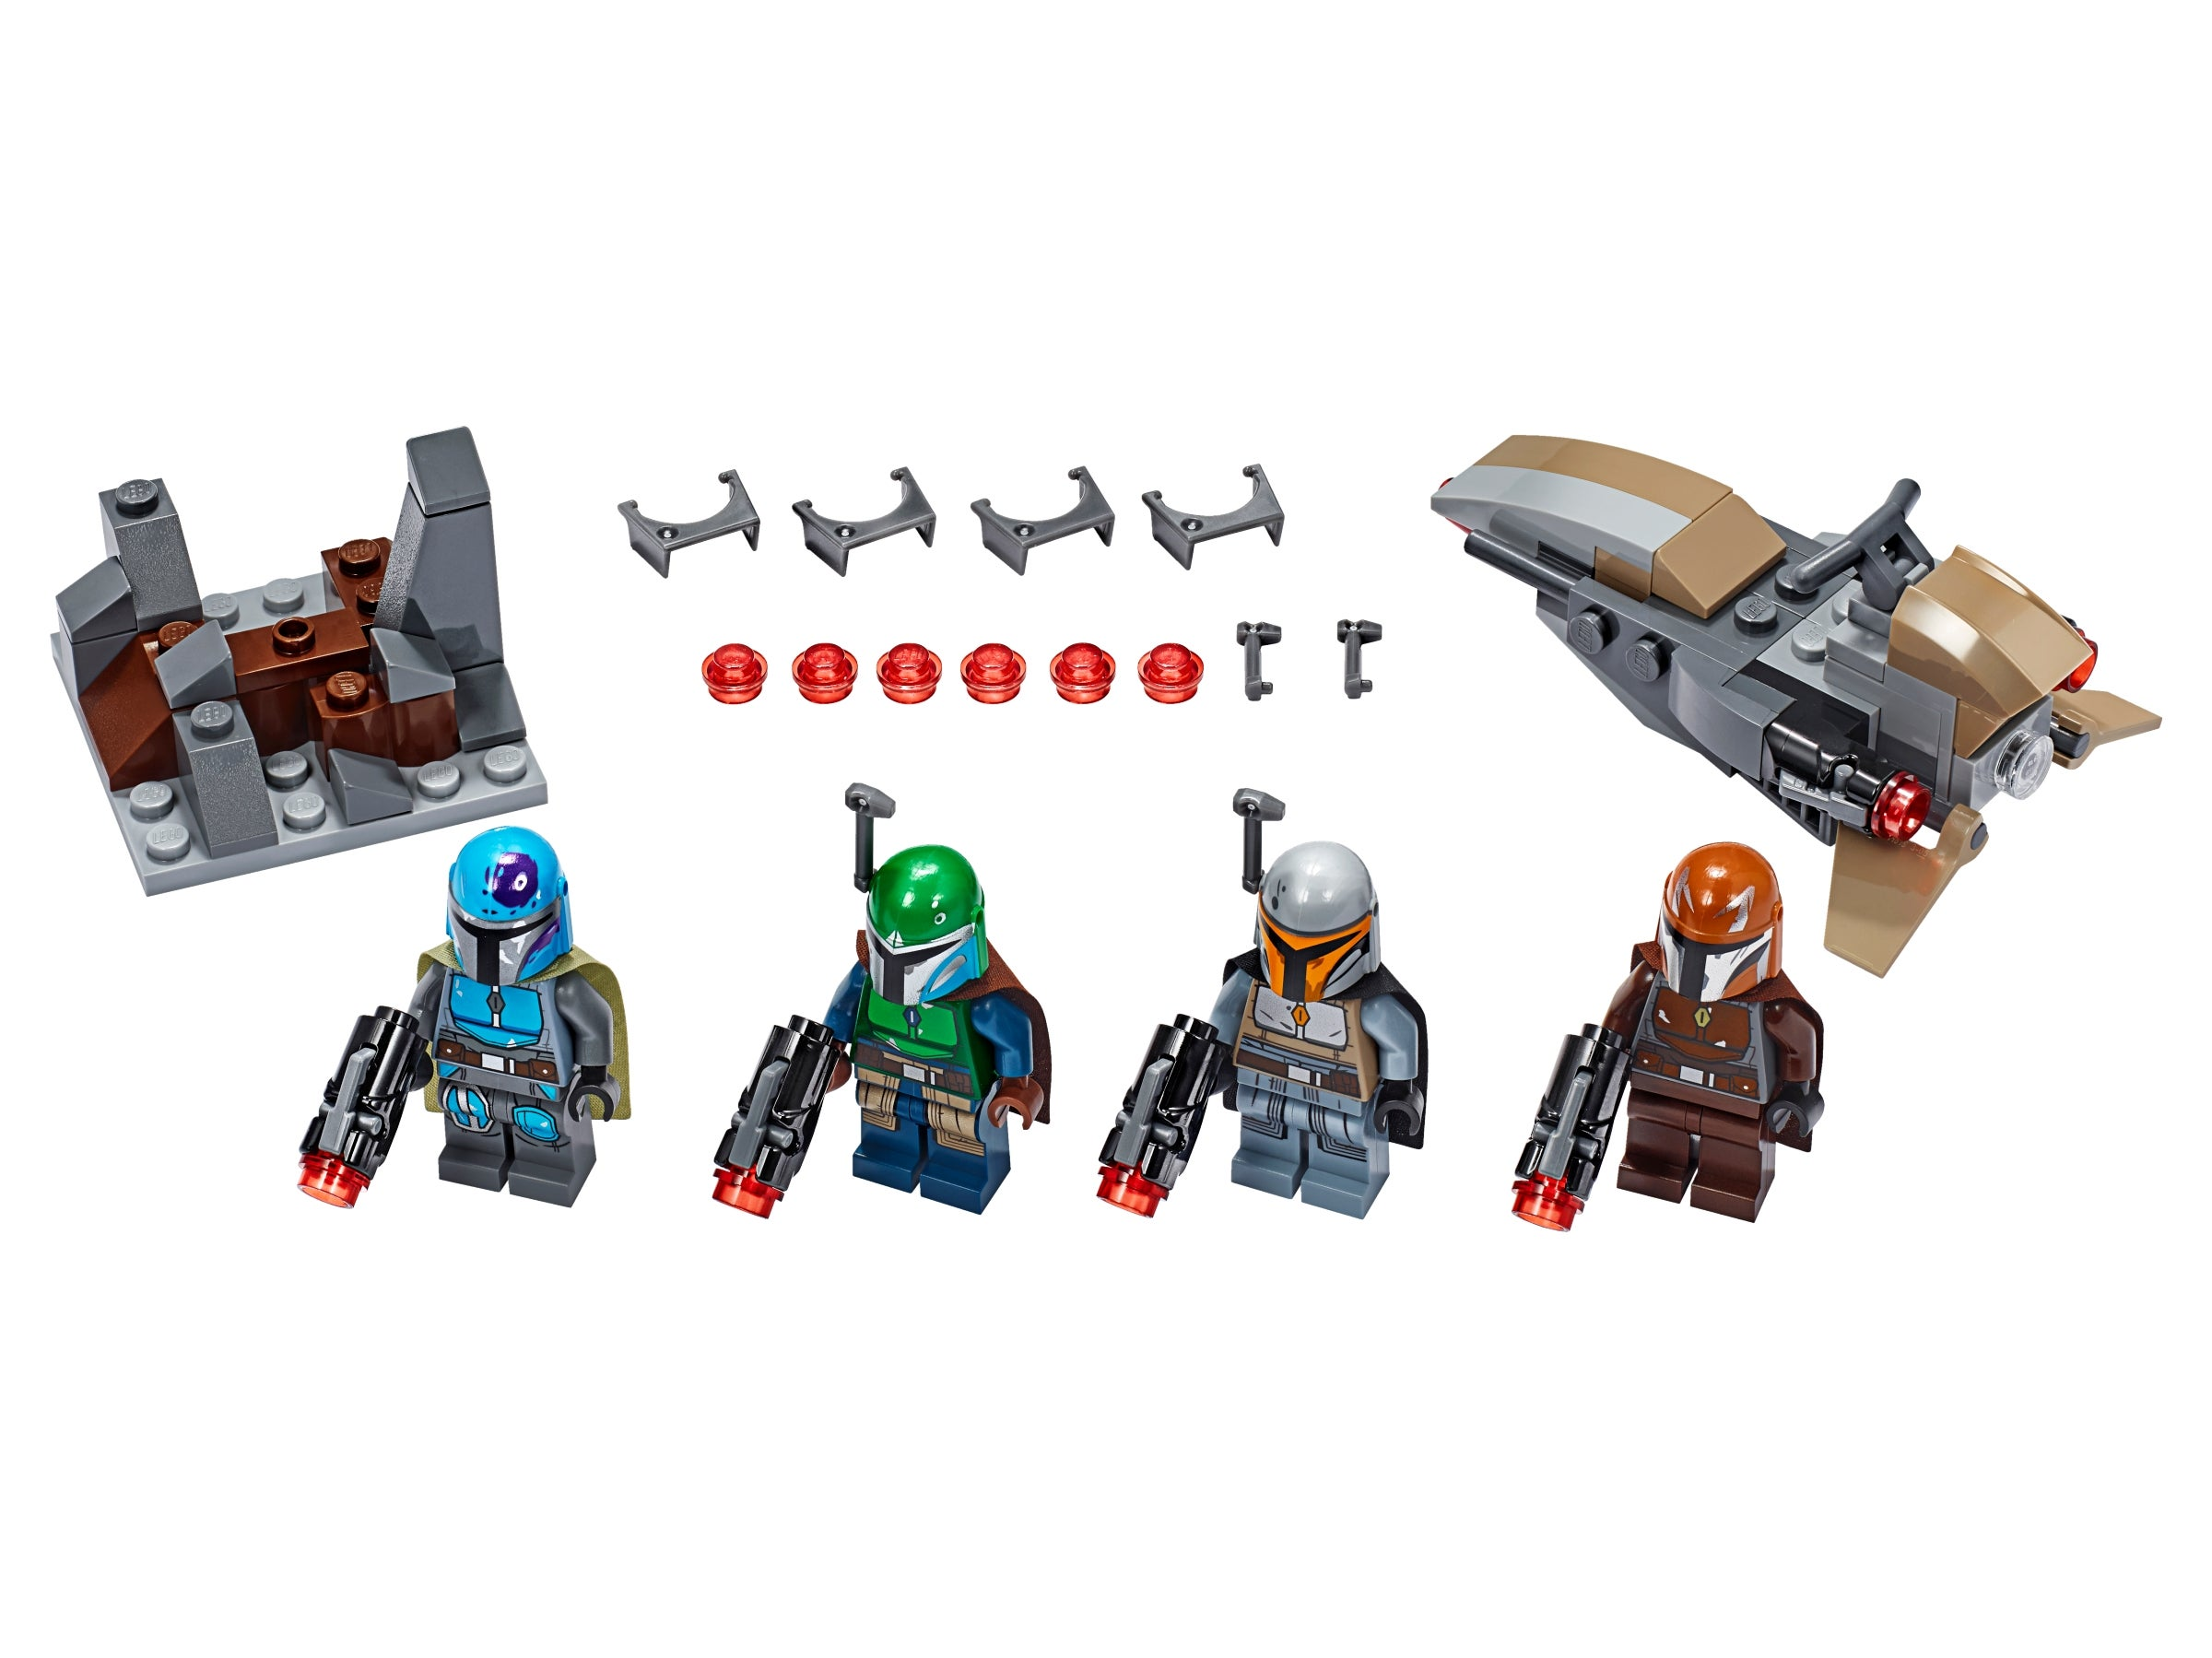 LEGO Star Wars 4 DARK GREY TROOPER VISORS FROM 75267 9496